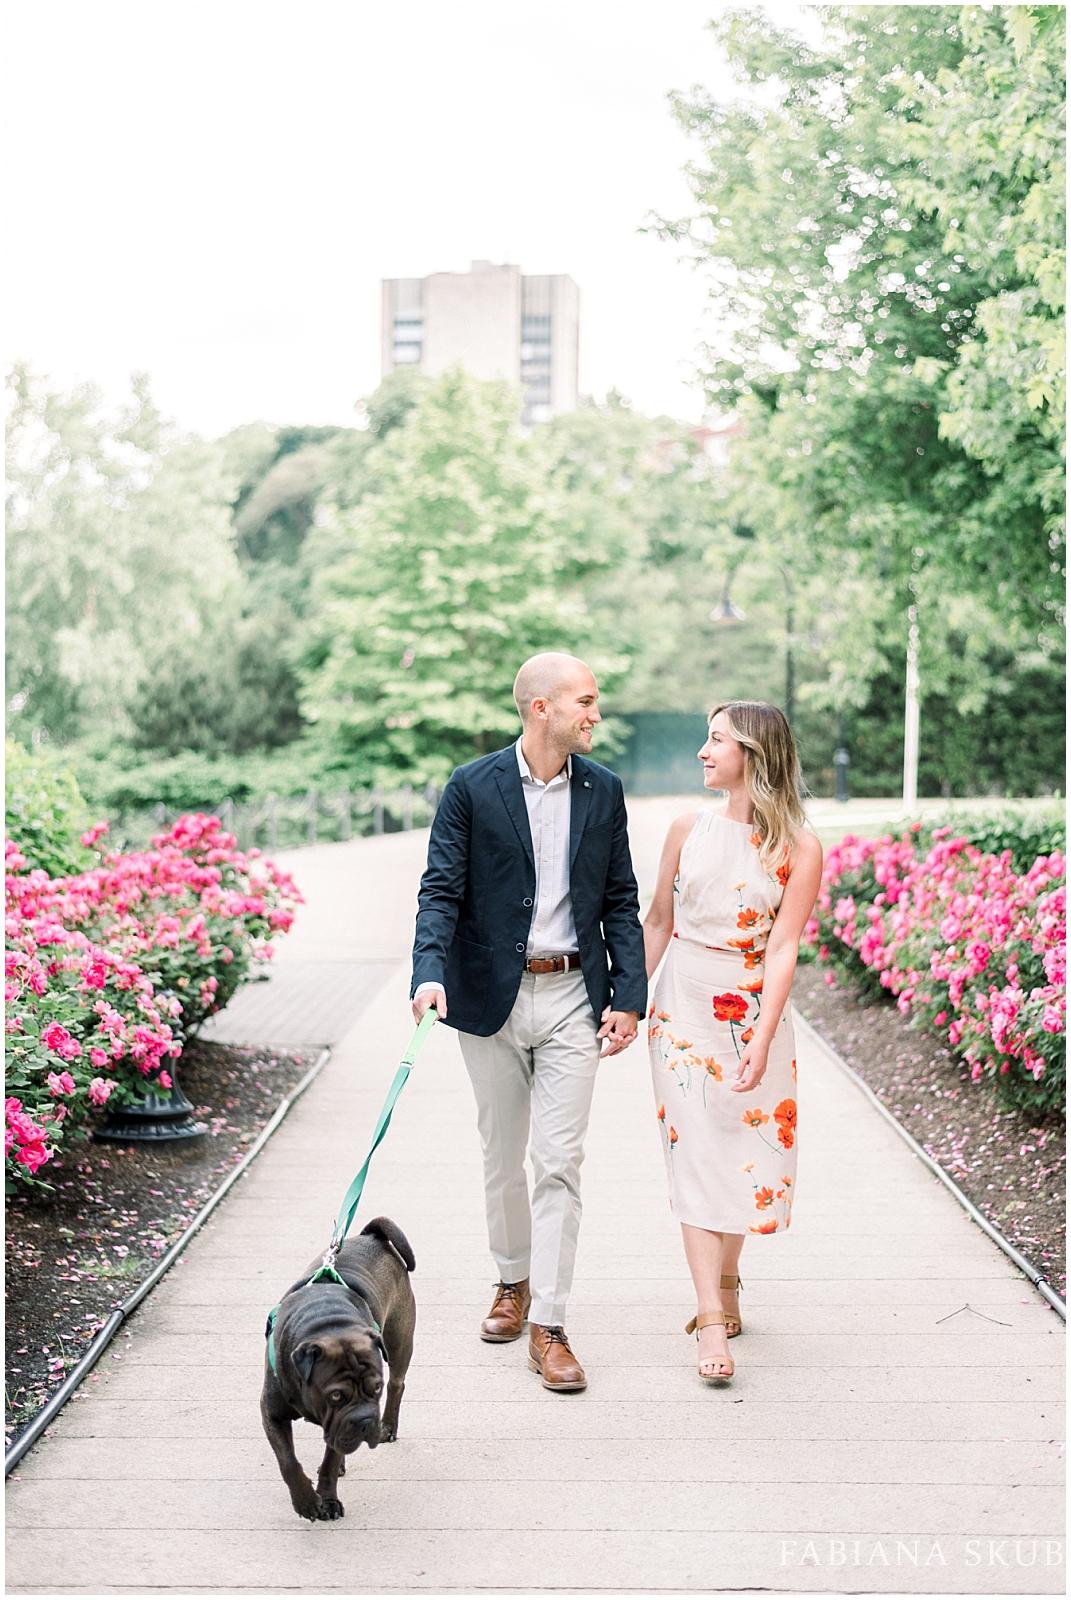 best-engagement-photos-wedding-photographer-nc-nj (4).jpg